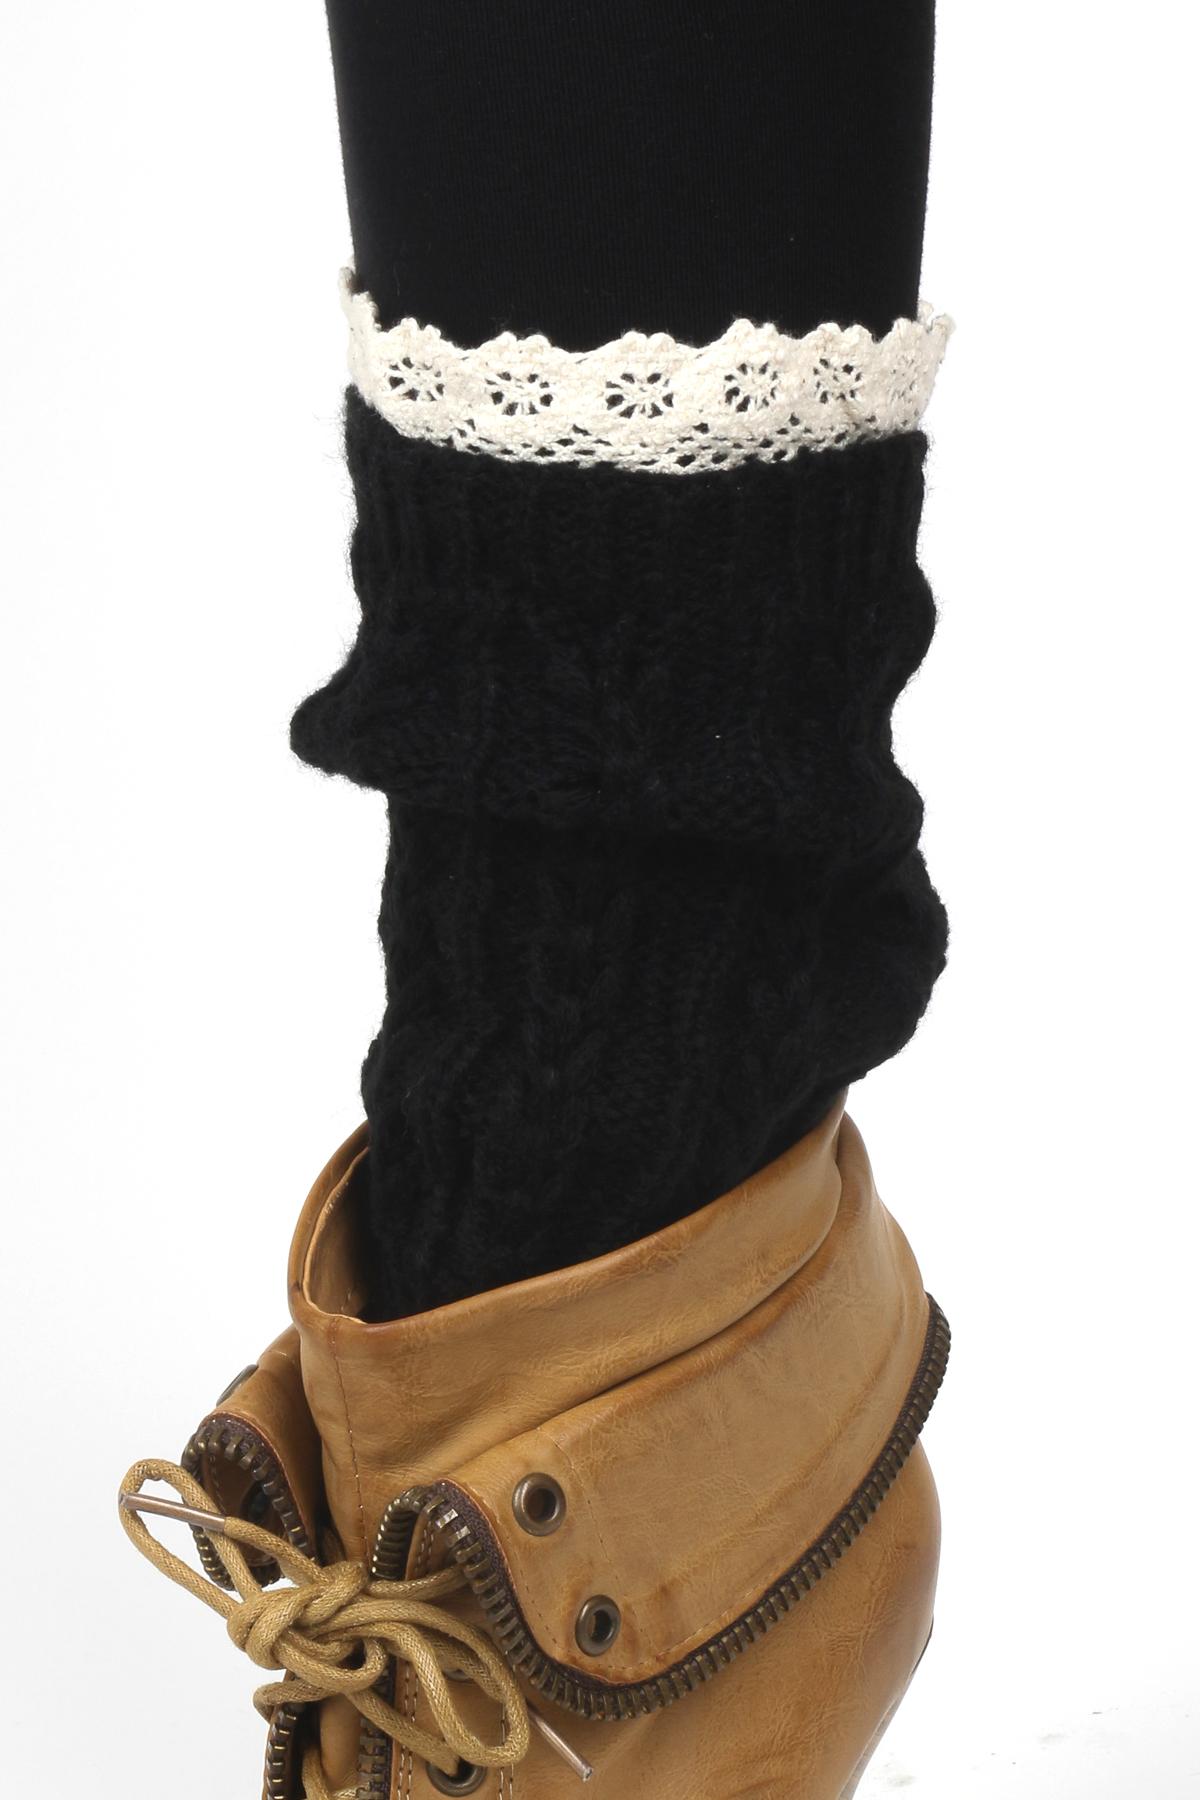 Knitted Lace Leg Warmers - Gloves U0026 Leg Warmers